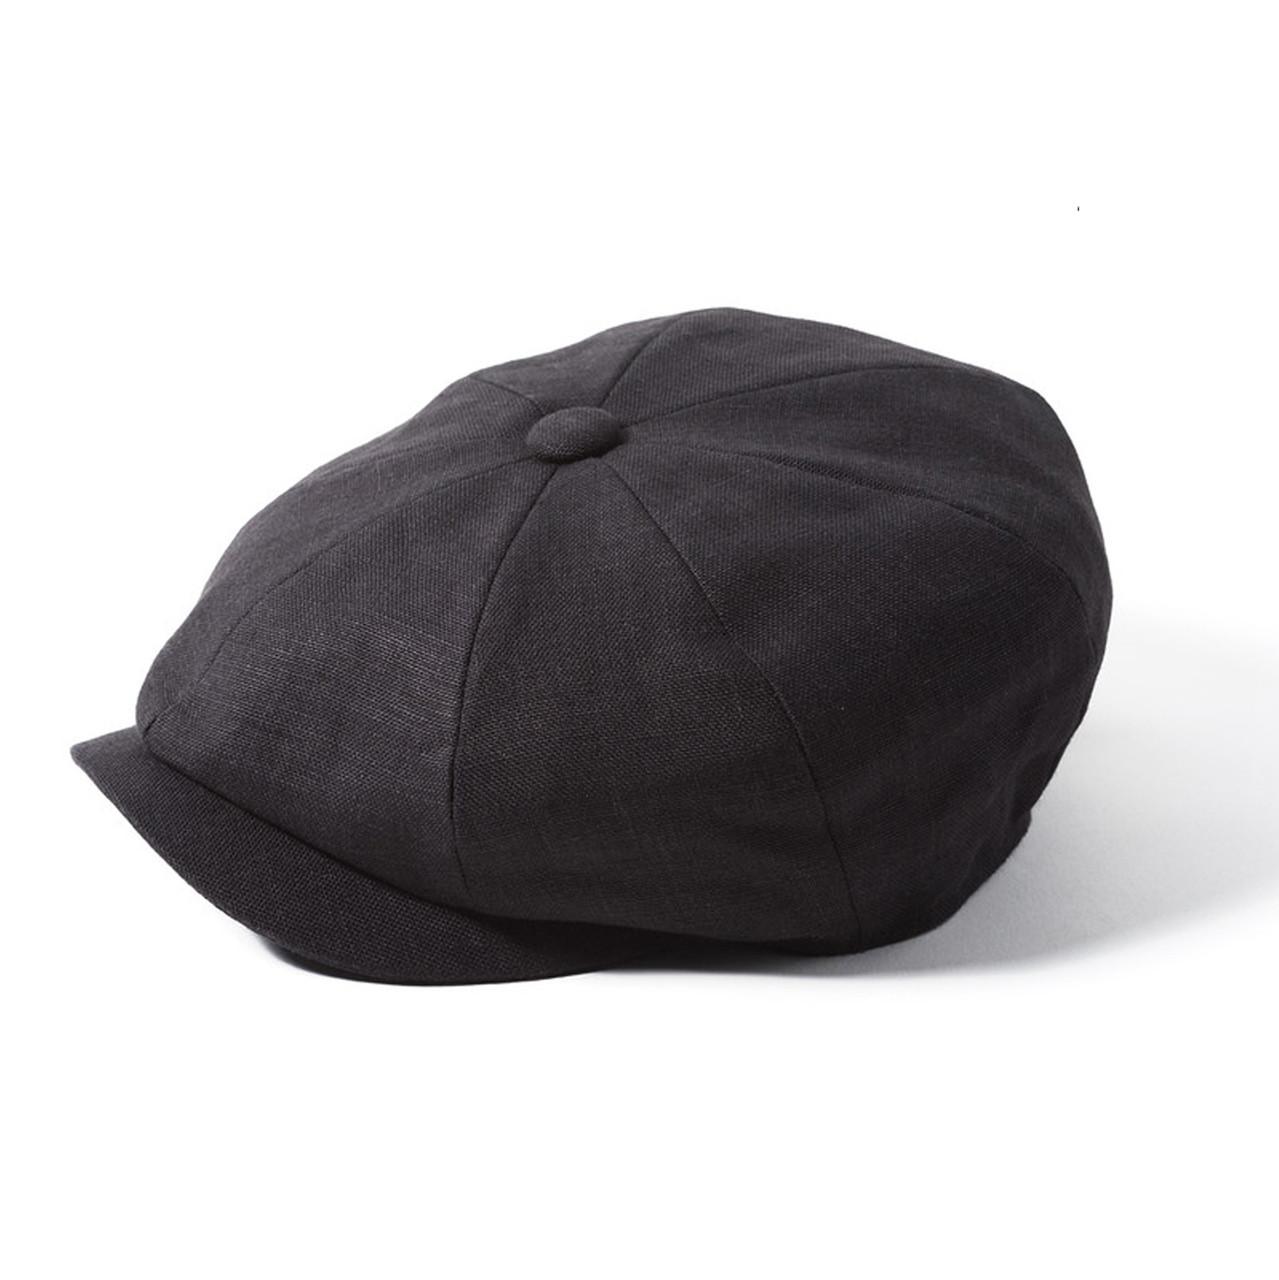 G/&H Dark-Grey 100/% Wool Flat Cap Herringbone Tweed Flat Cap Harris